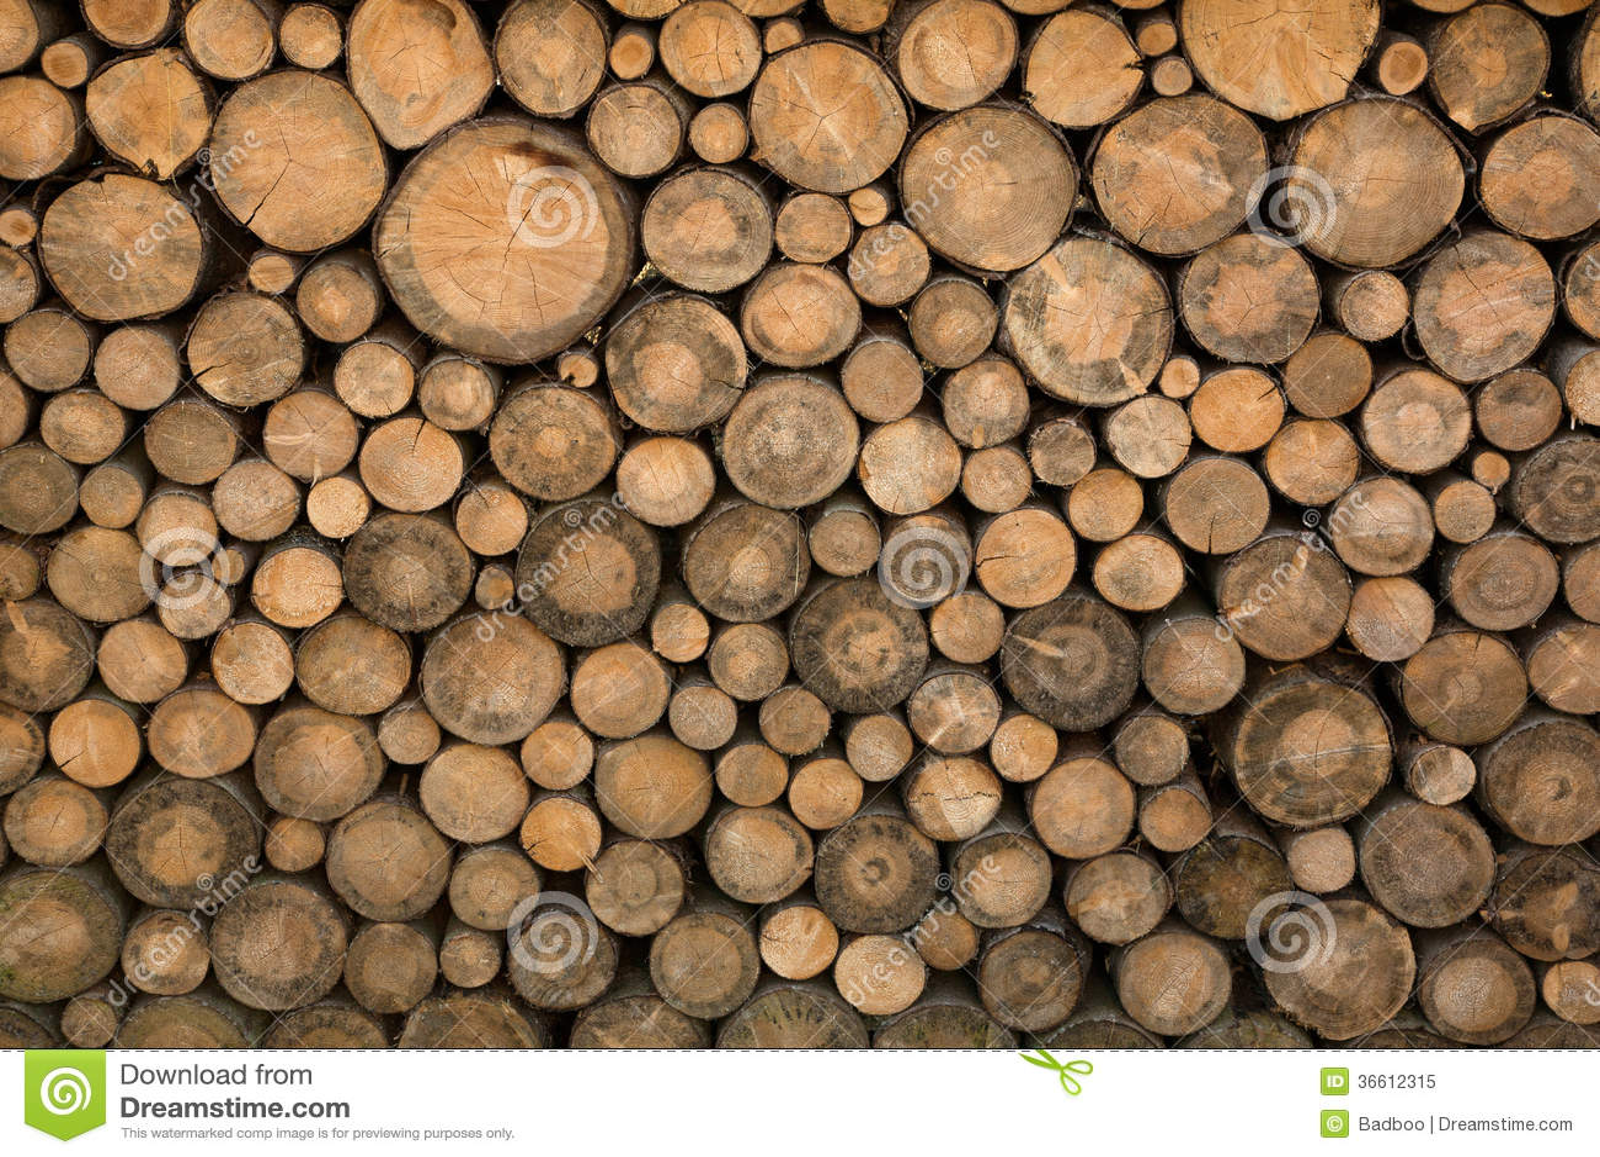 tree branch wallpaper